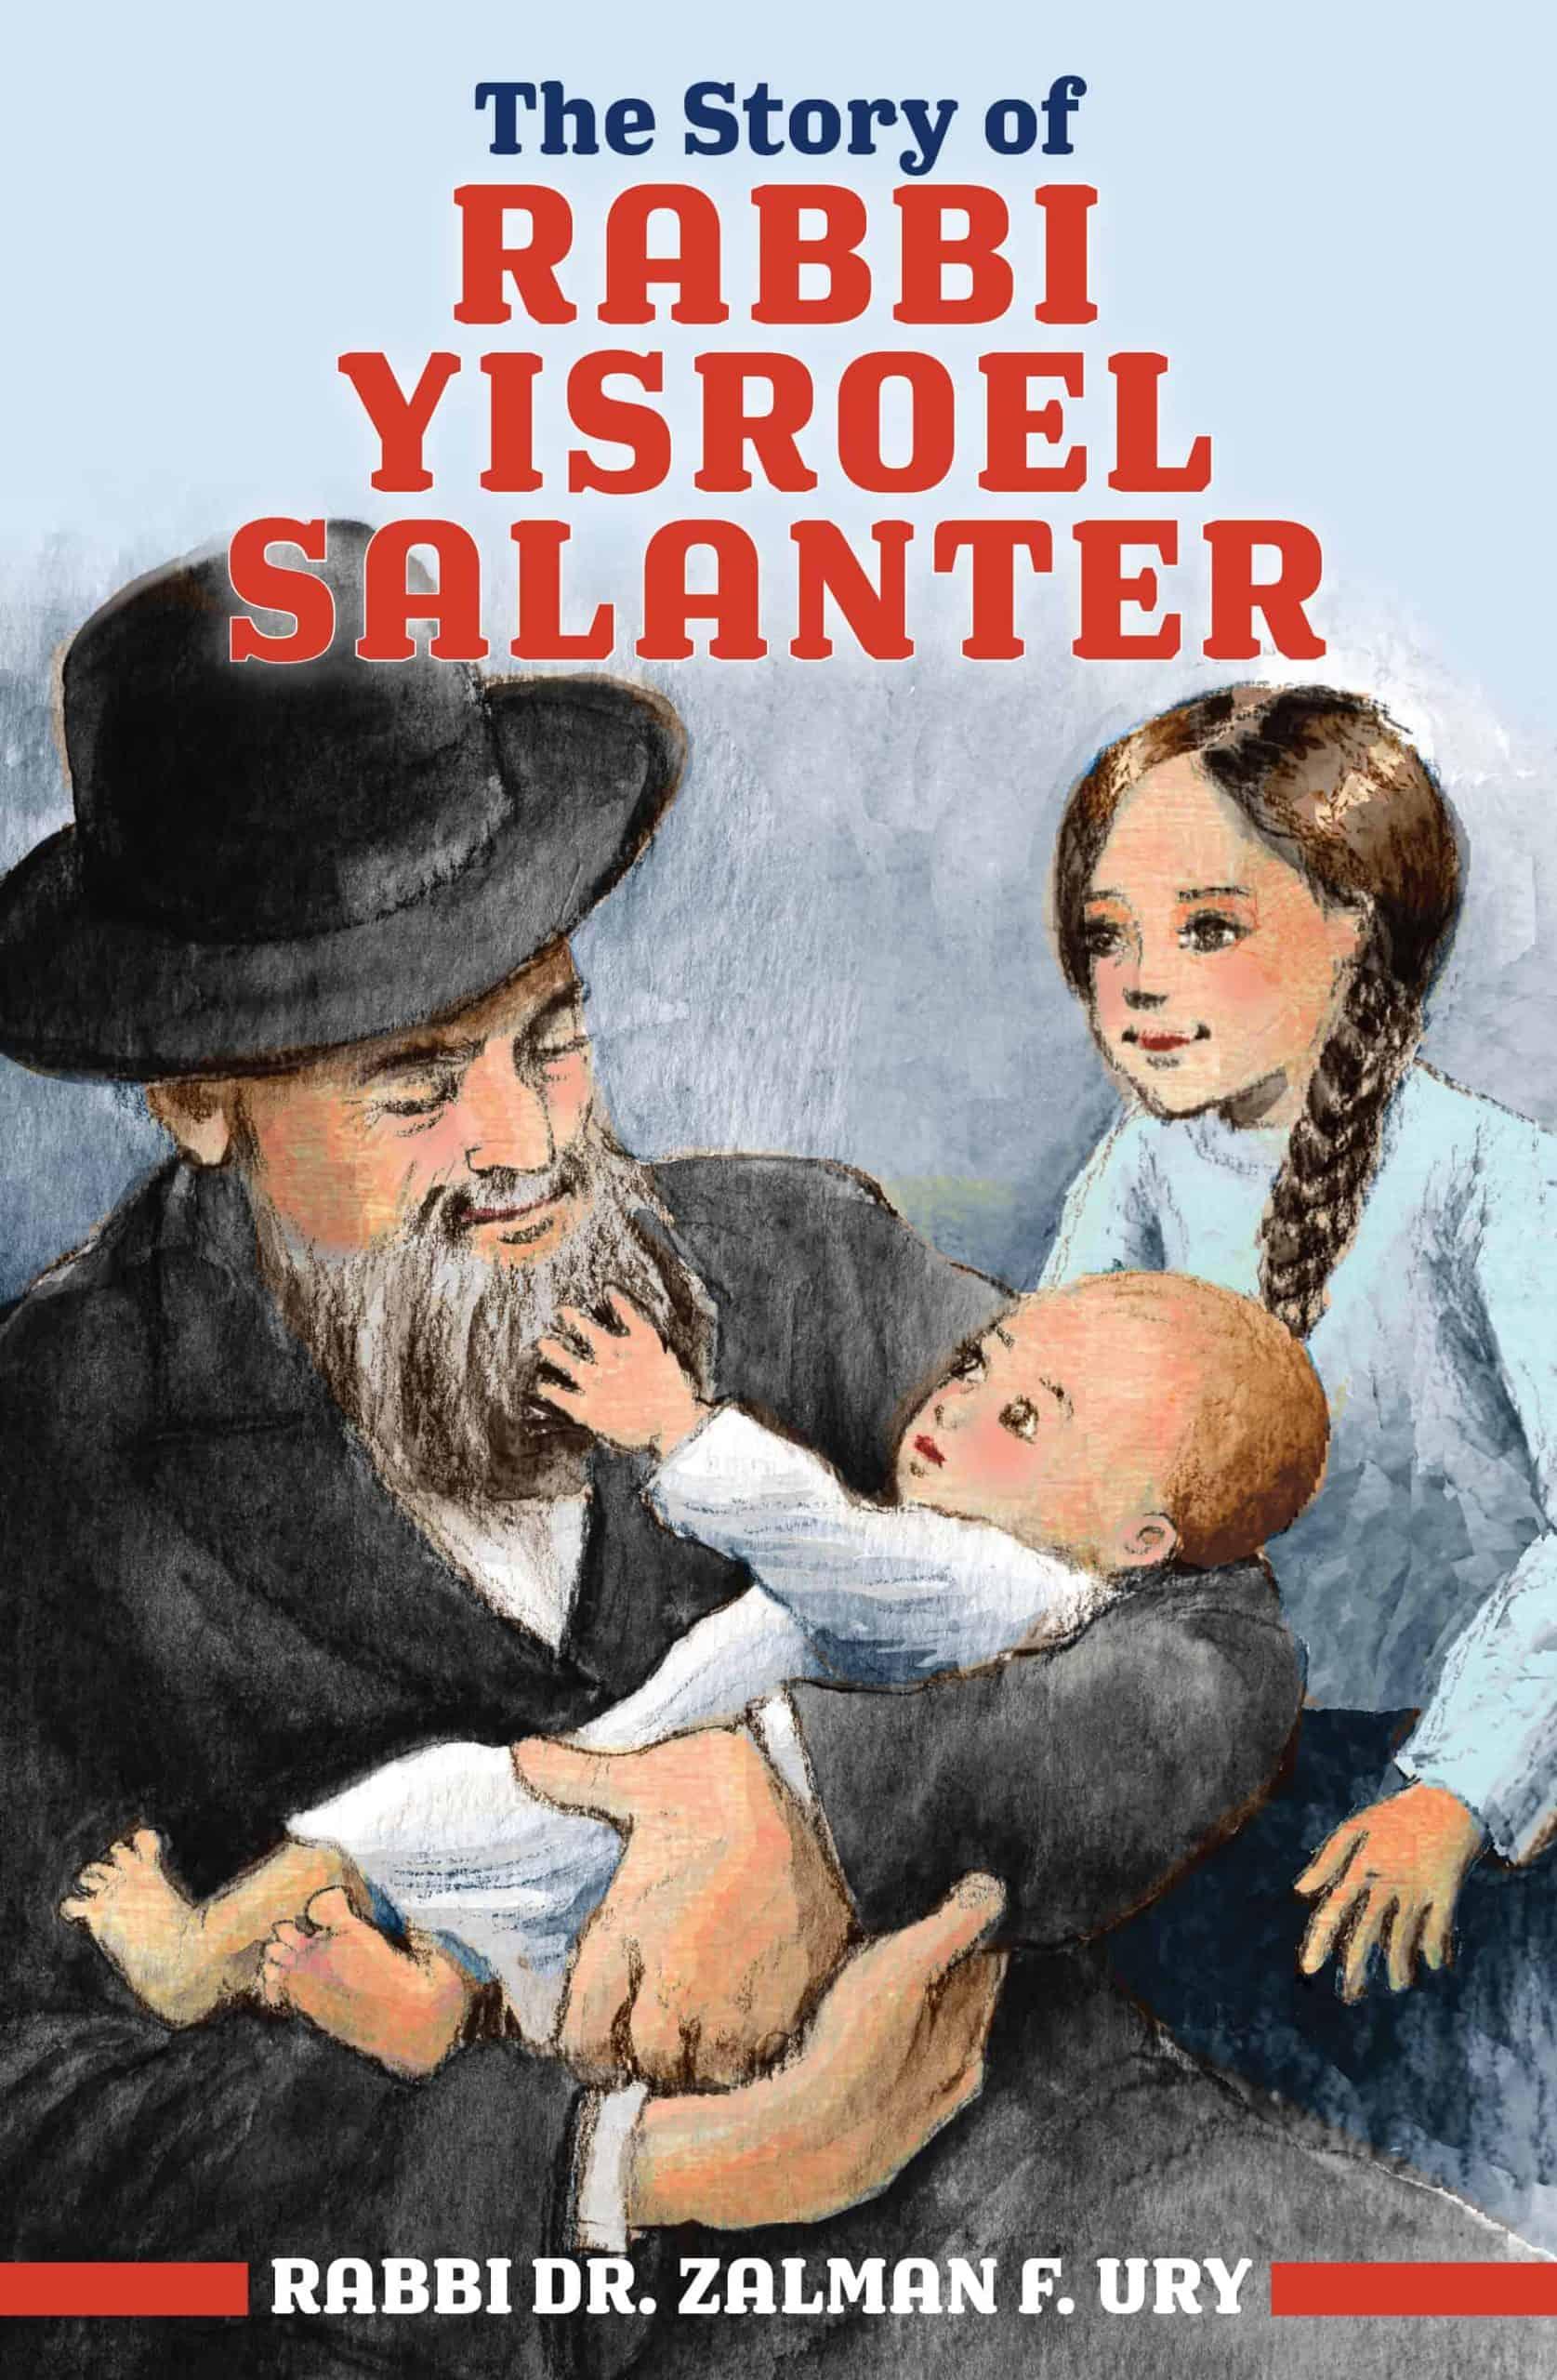 The Story of Rabbi Yisroel Salanter